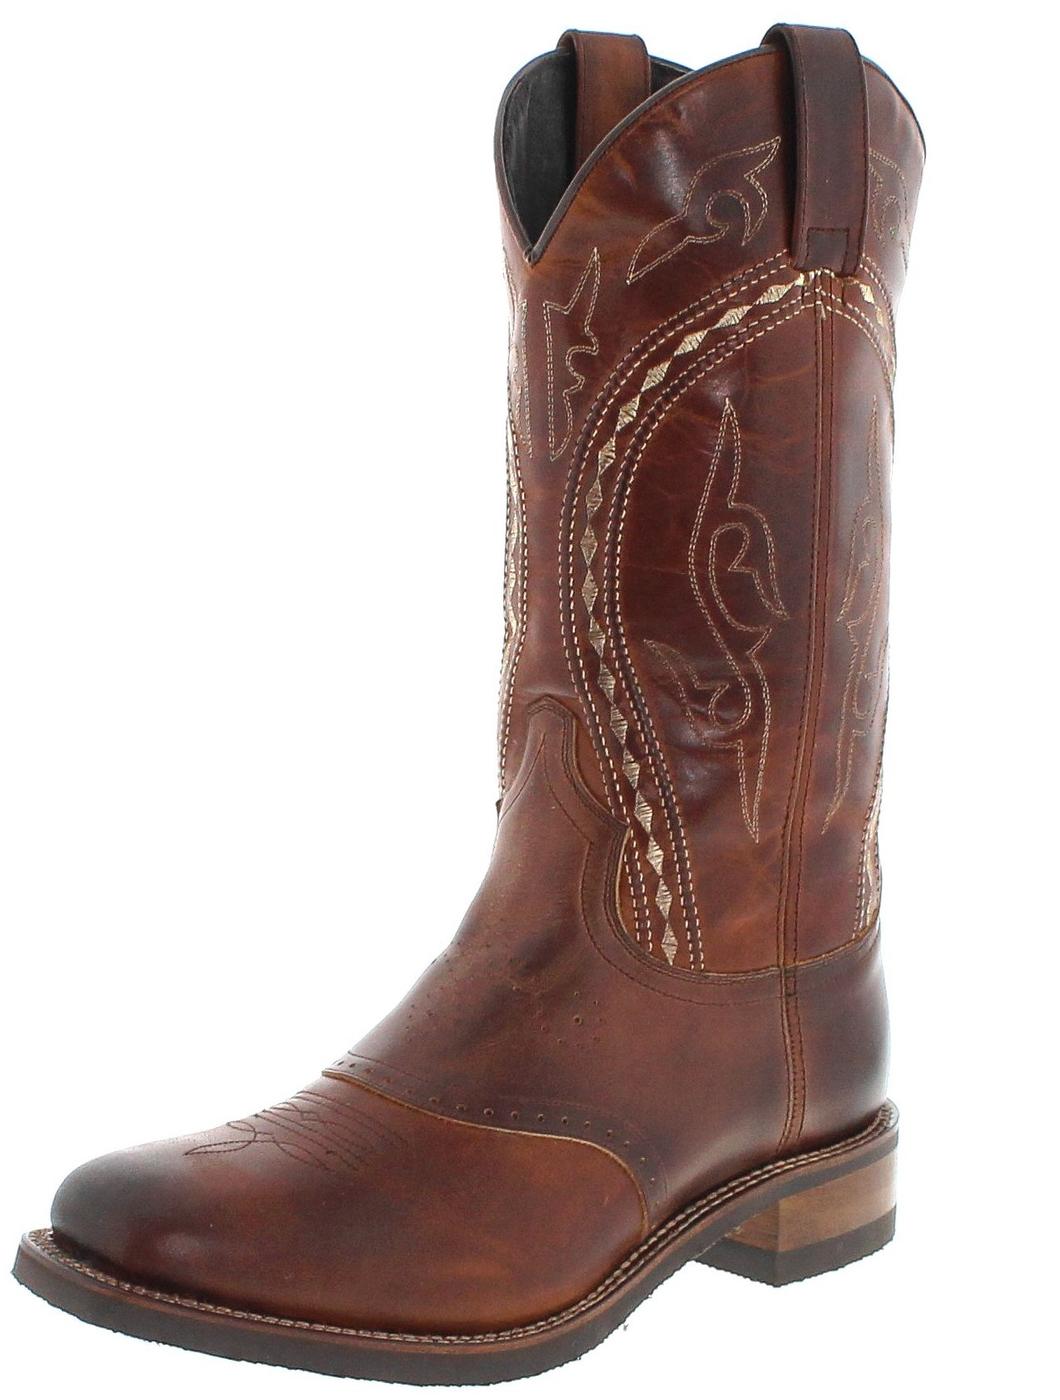 Sendra Boots 14339 Tang Marron Westernreitstiefel mit Thinsulate Isolierung - braun